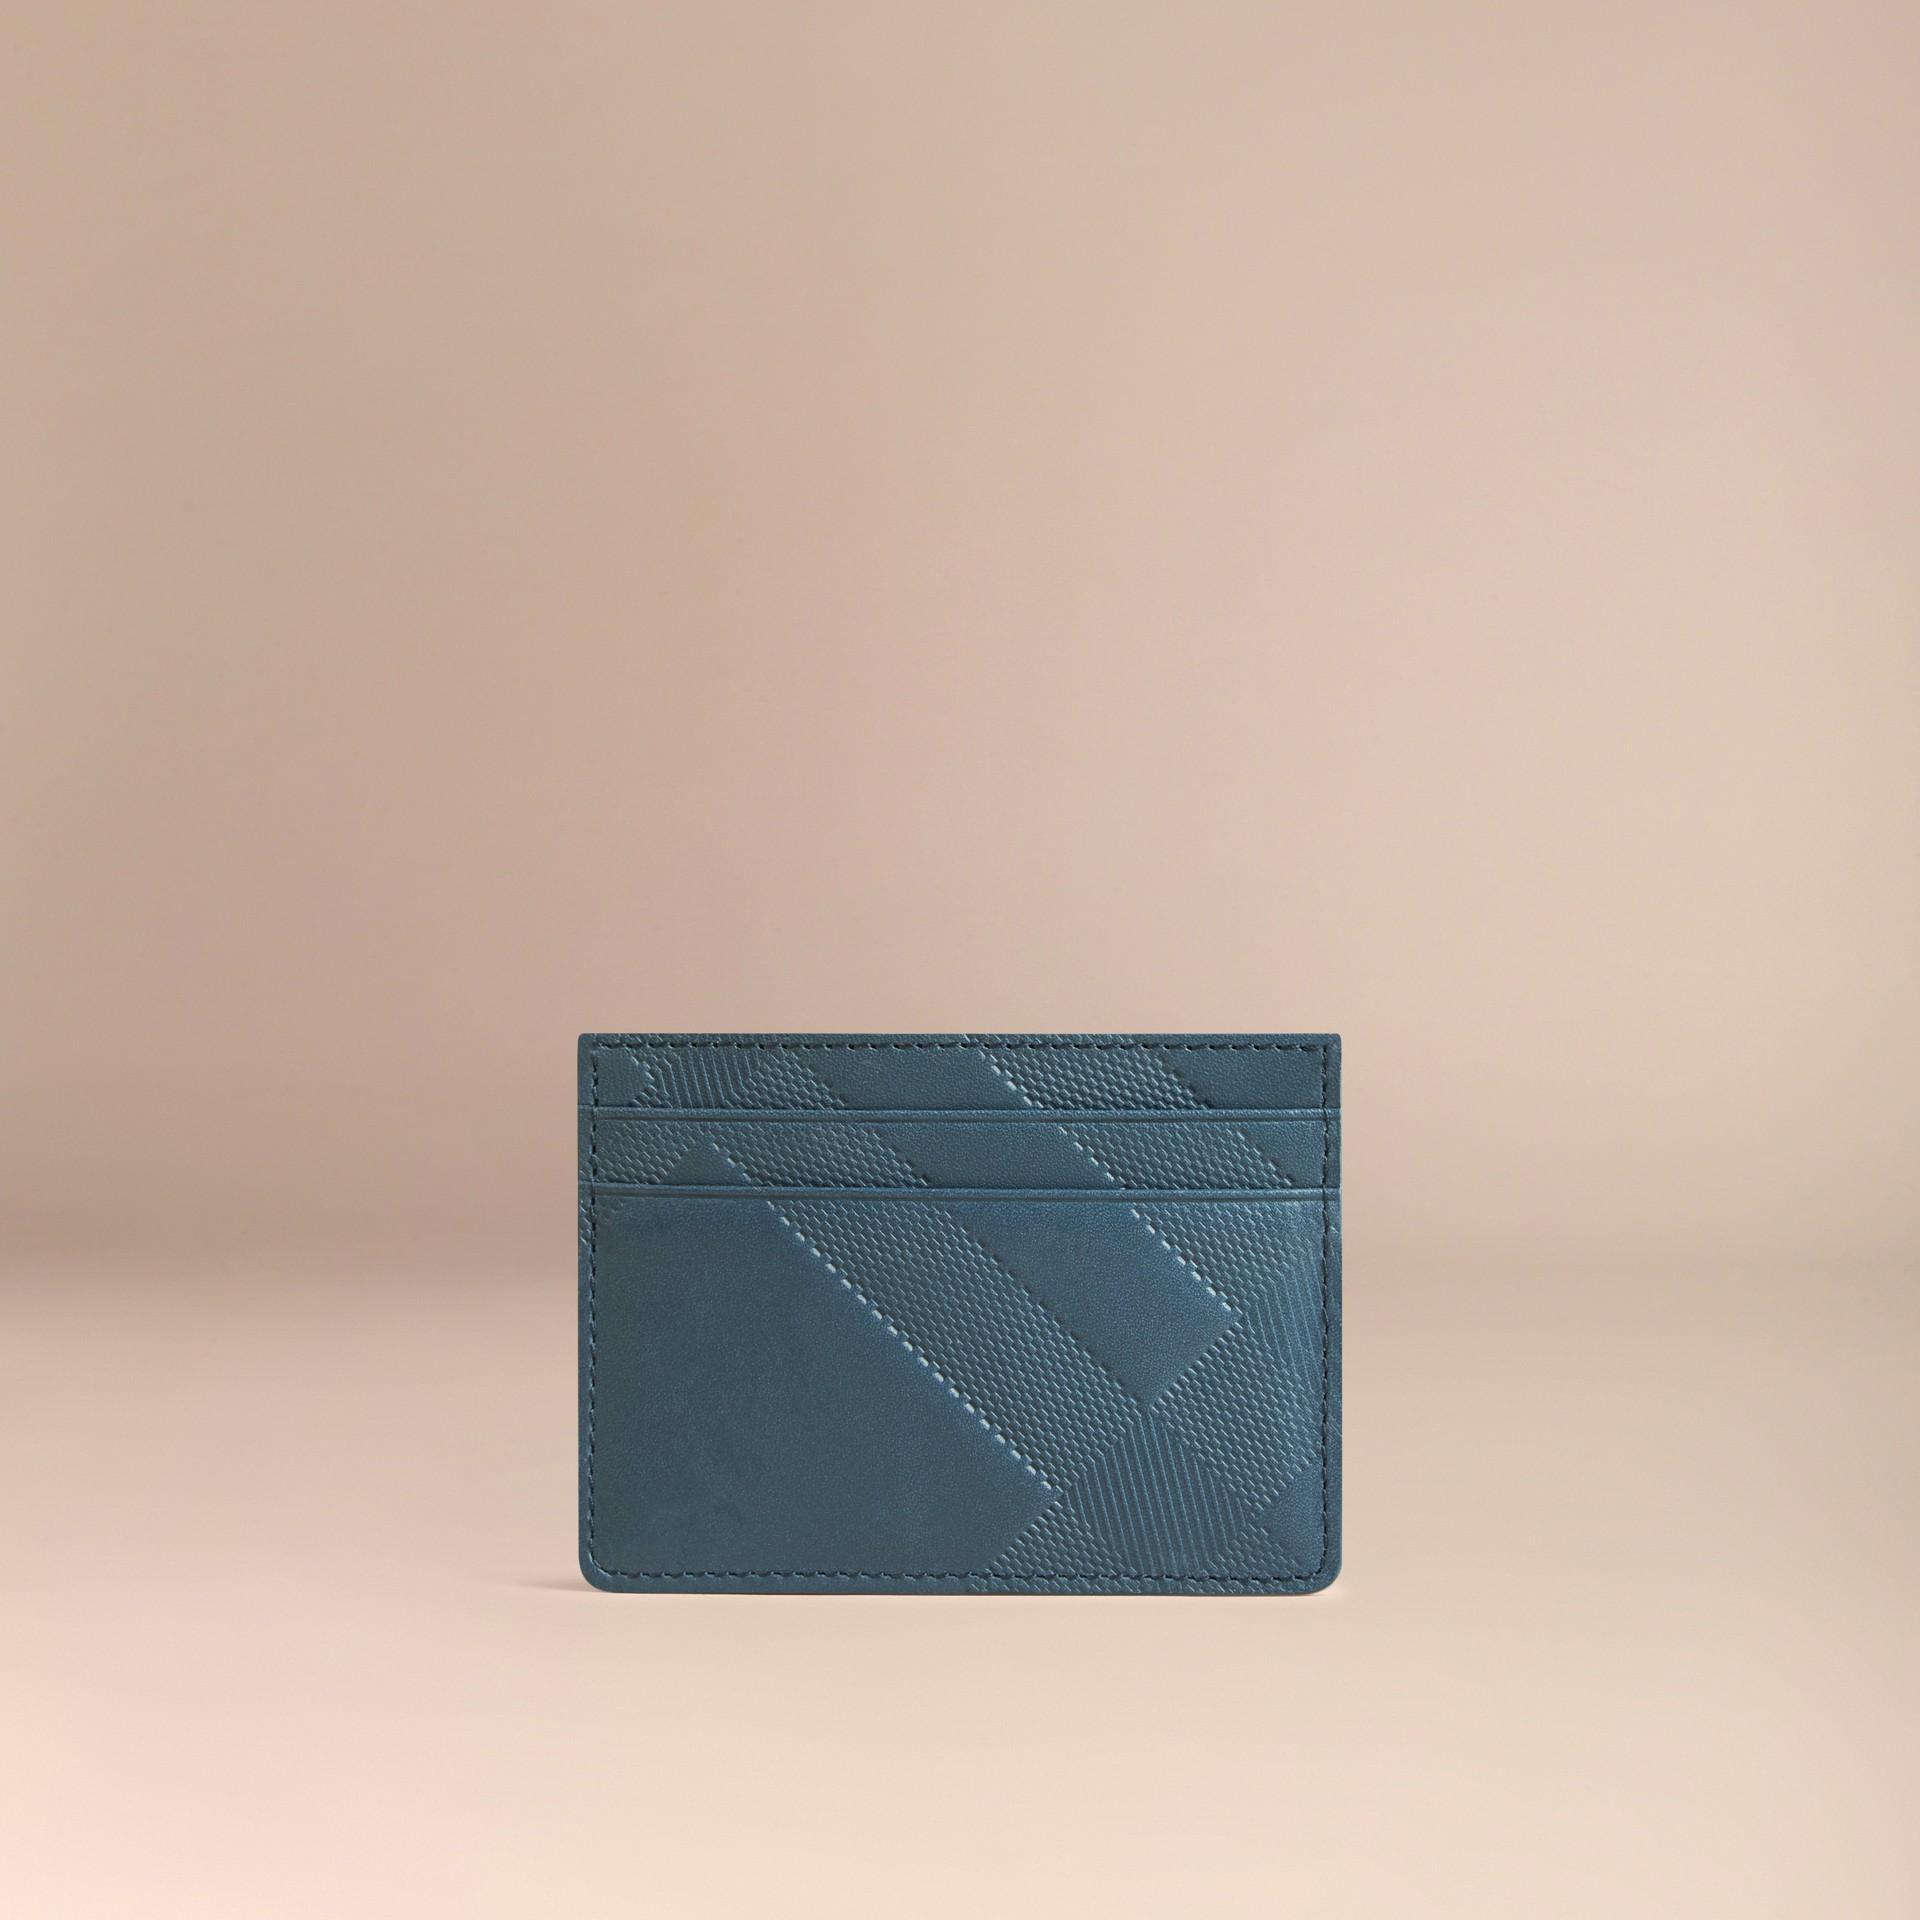 Bleu acier Porte-cartes en cuir à motif check en relief Bleu Acier - photo de la galerie 3